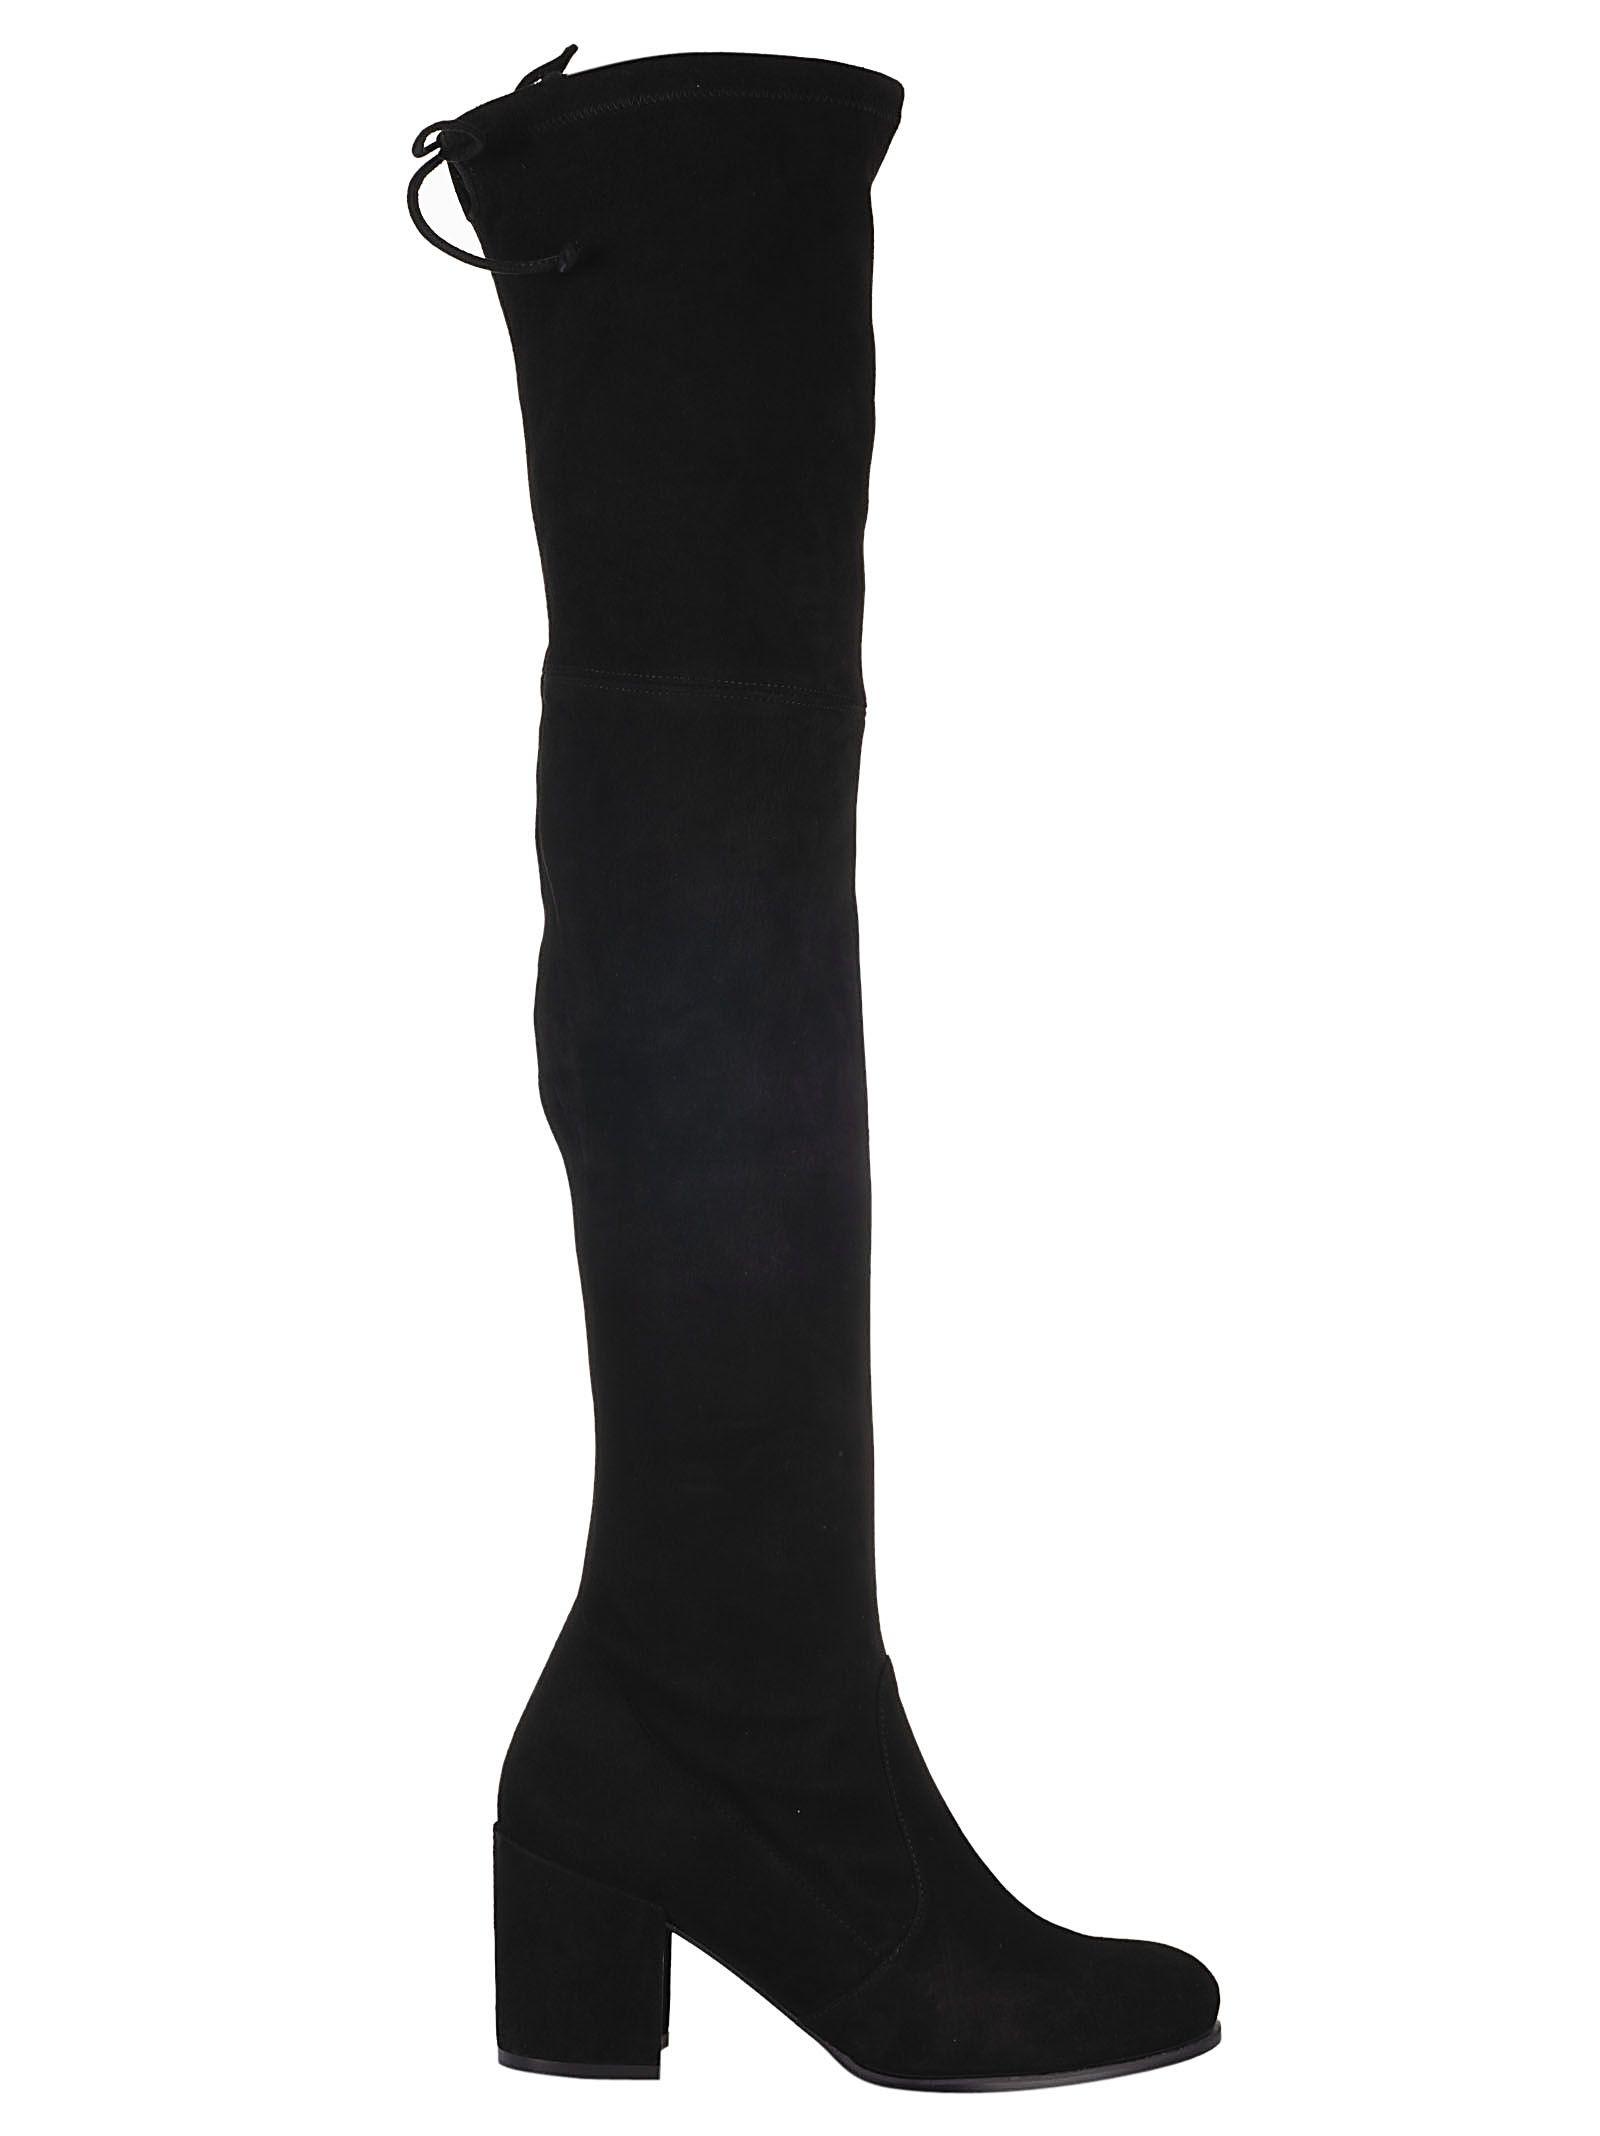 Tieland Boots, Black